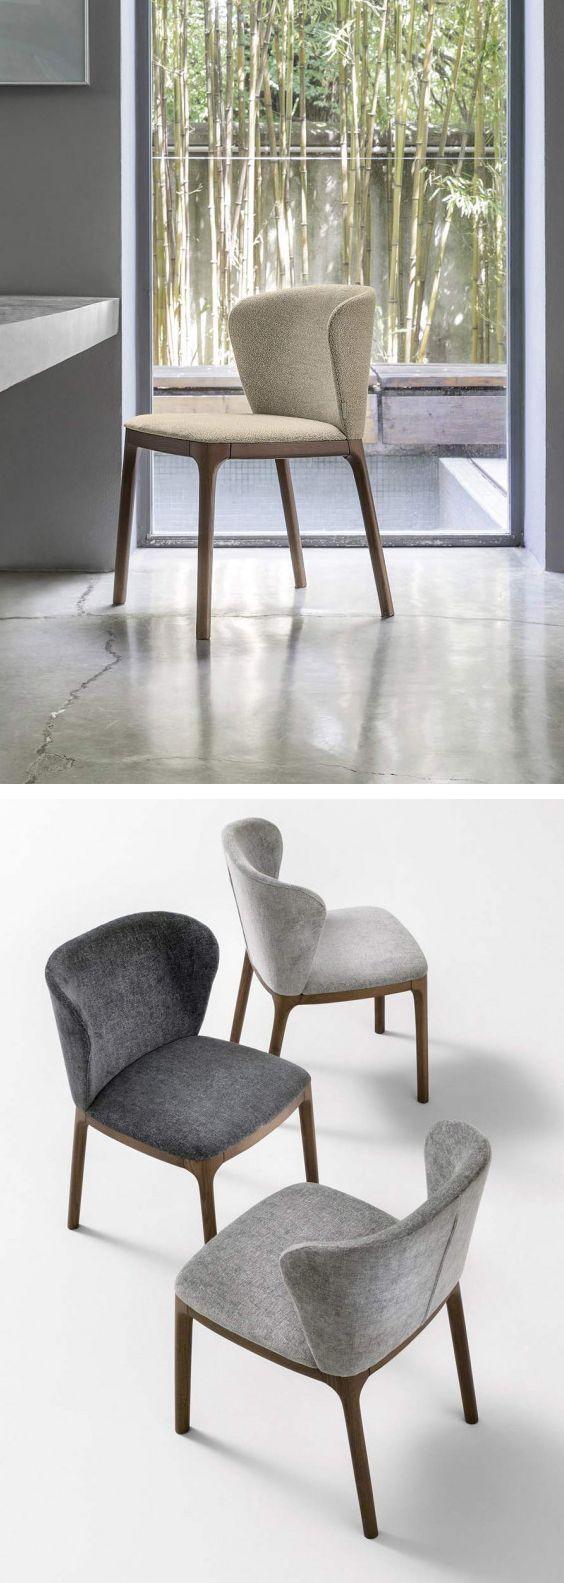 48 best Möbel - Ess Stühle images on Pinterest | Essen, Side chairs ...